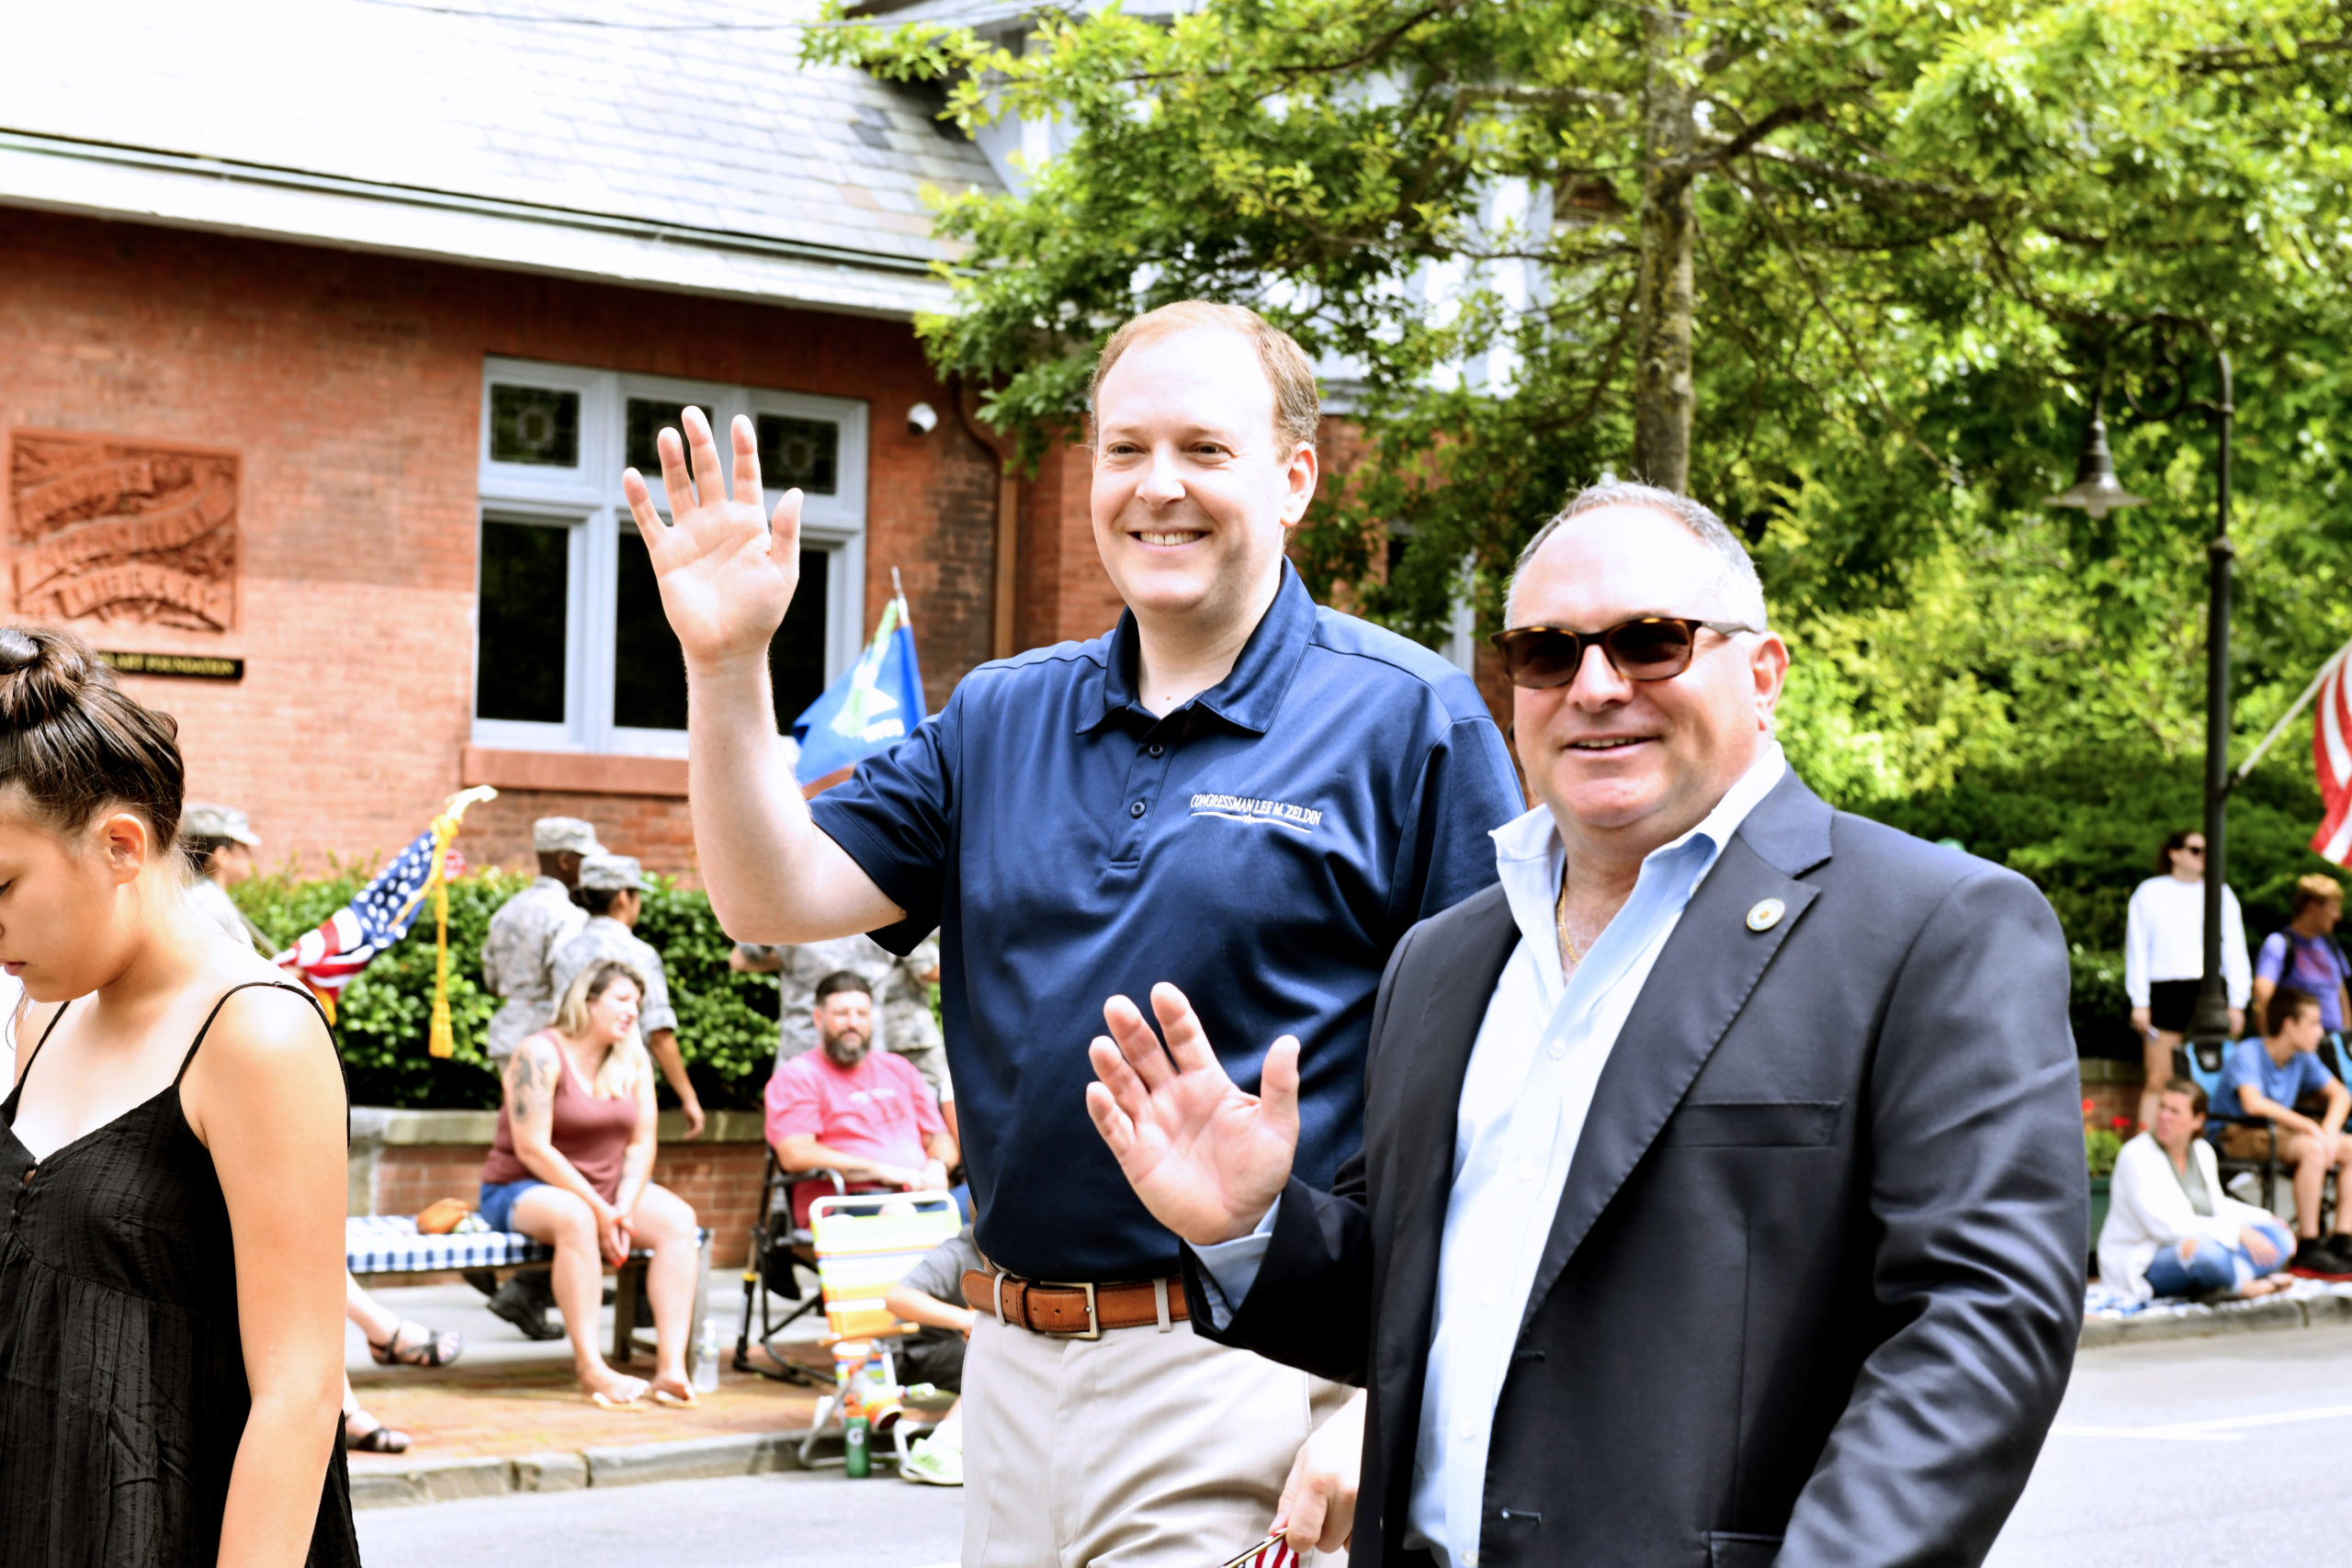 U.S. Representative Lee Zeldin with Southampton Town Trustee Scott Horowitz during the July Fourth parade in Southampton Village. DANA SHAW